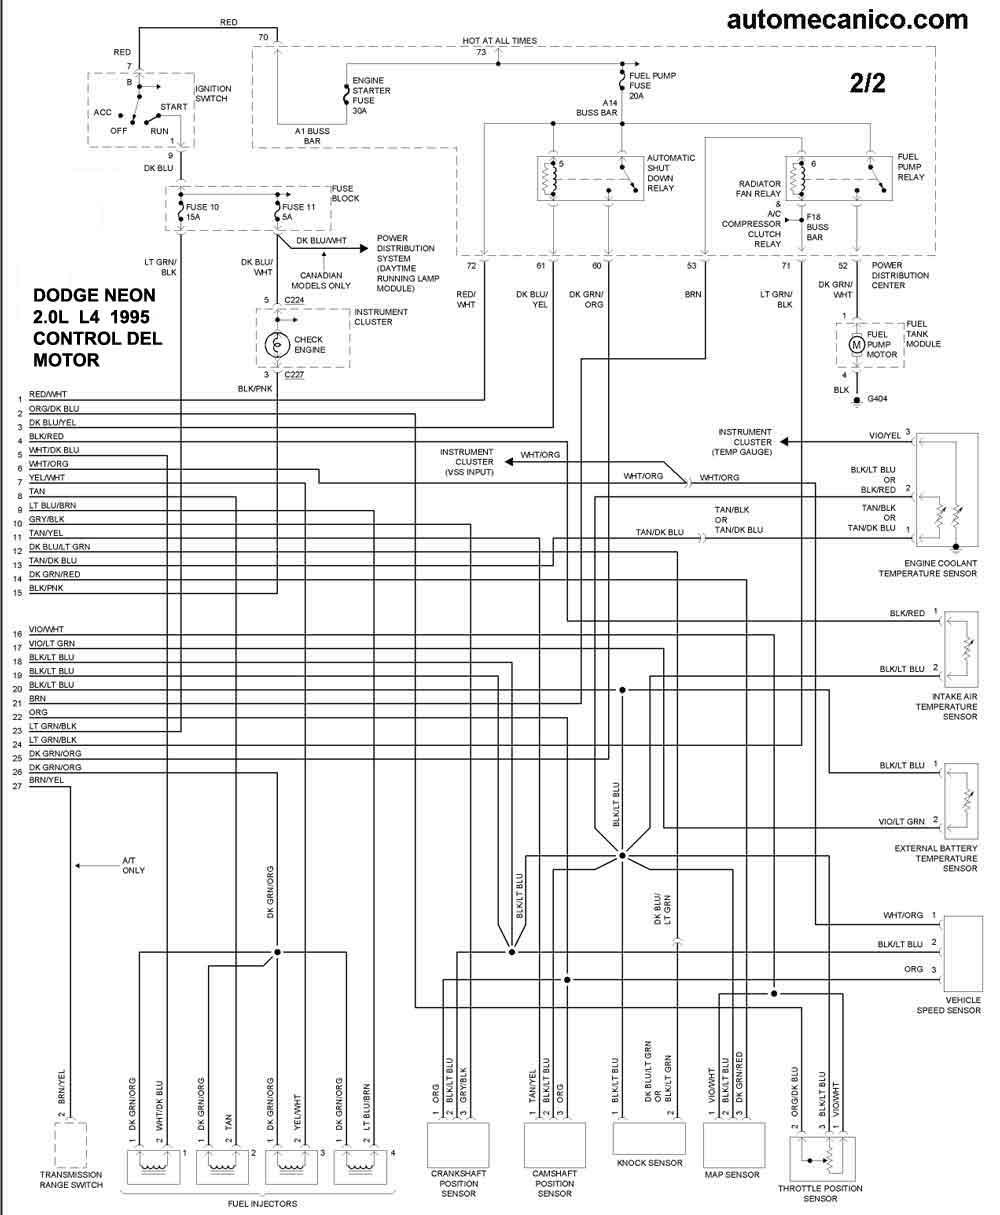 hight resolution of dodge neon wiring diagram dodge neon steering diagram hobart hcm 450 wiring diagram generation 4 wiring